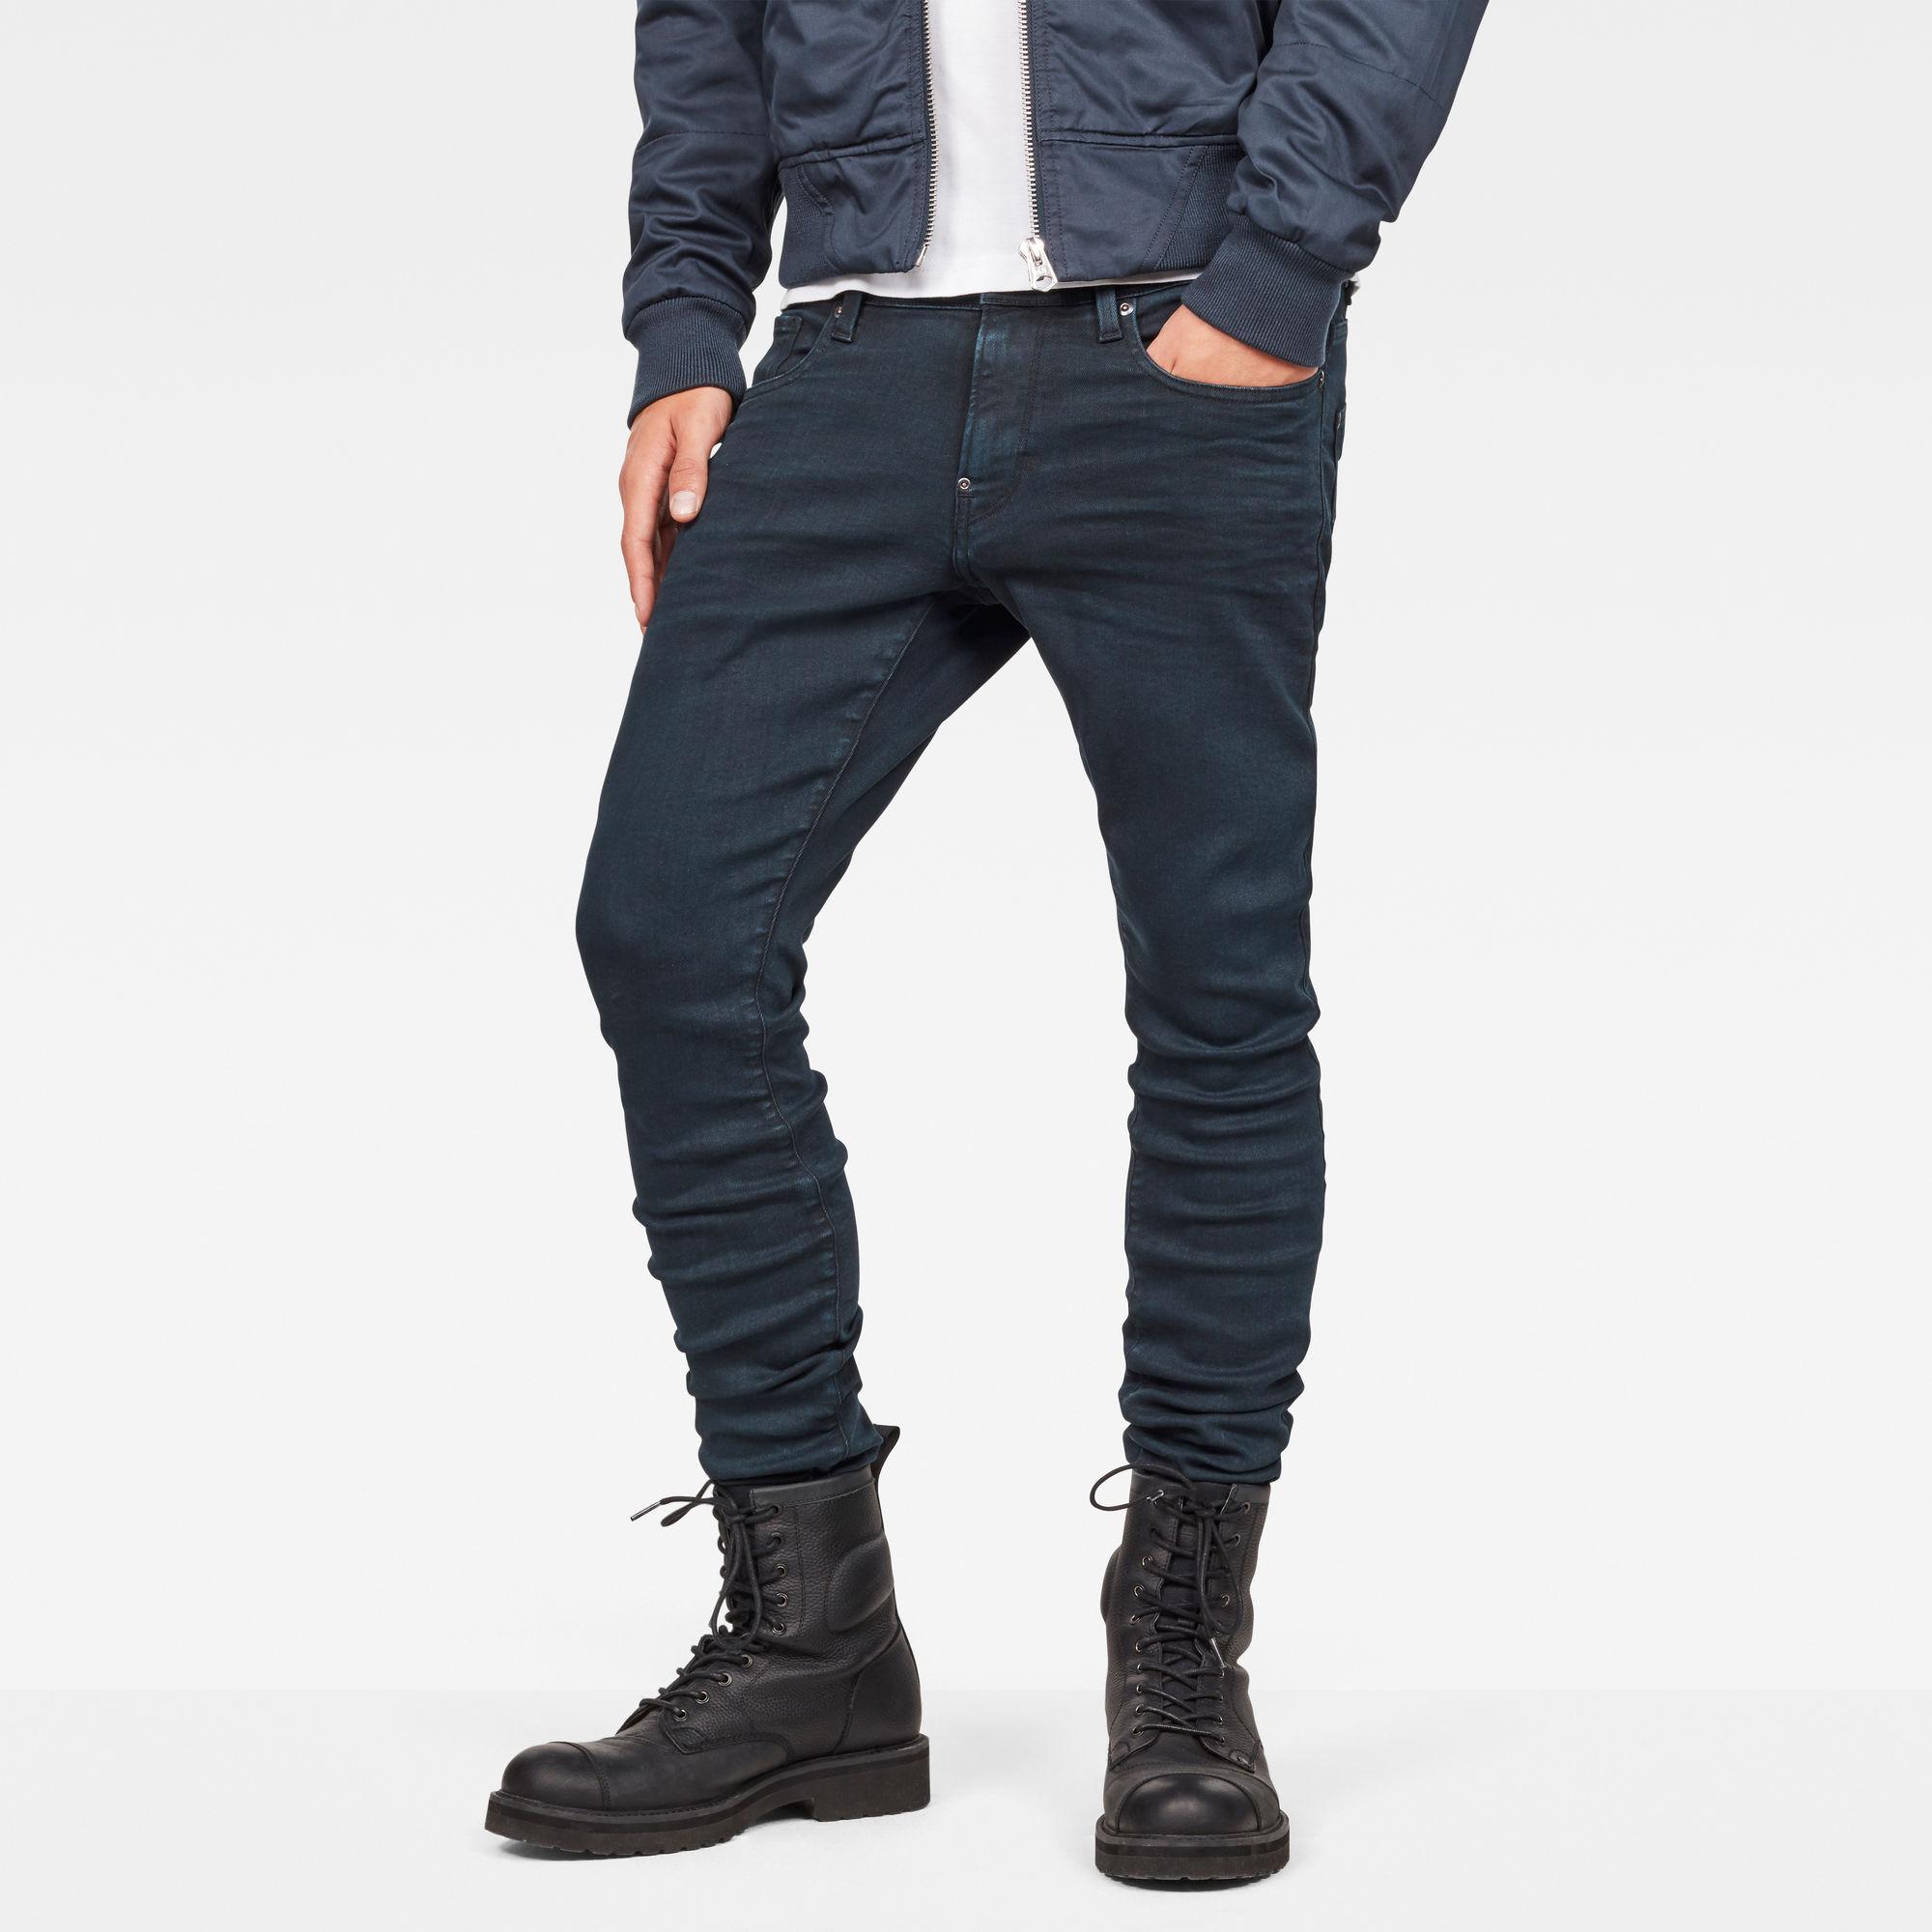 Revend Skinny Color Jeans